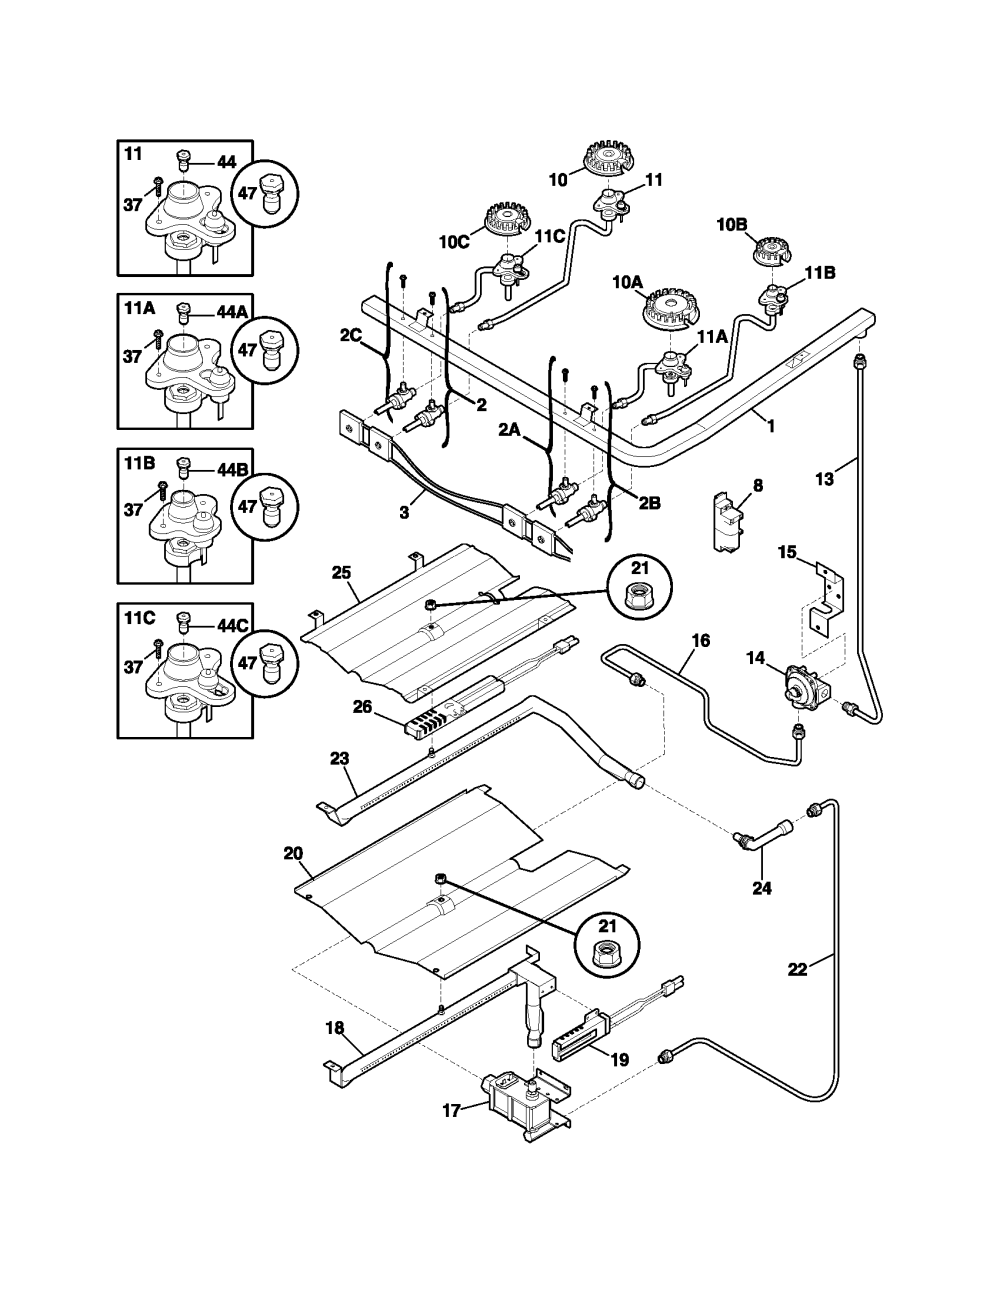 medium resolution of gas stove wiring diagram wiring diagrams scematic kenmore gas stove wiring diagram frigidaire plgf389ccc gas range